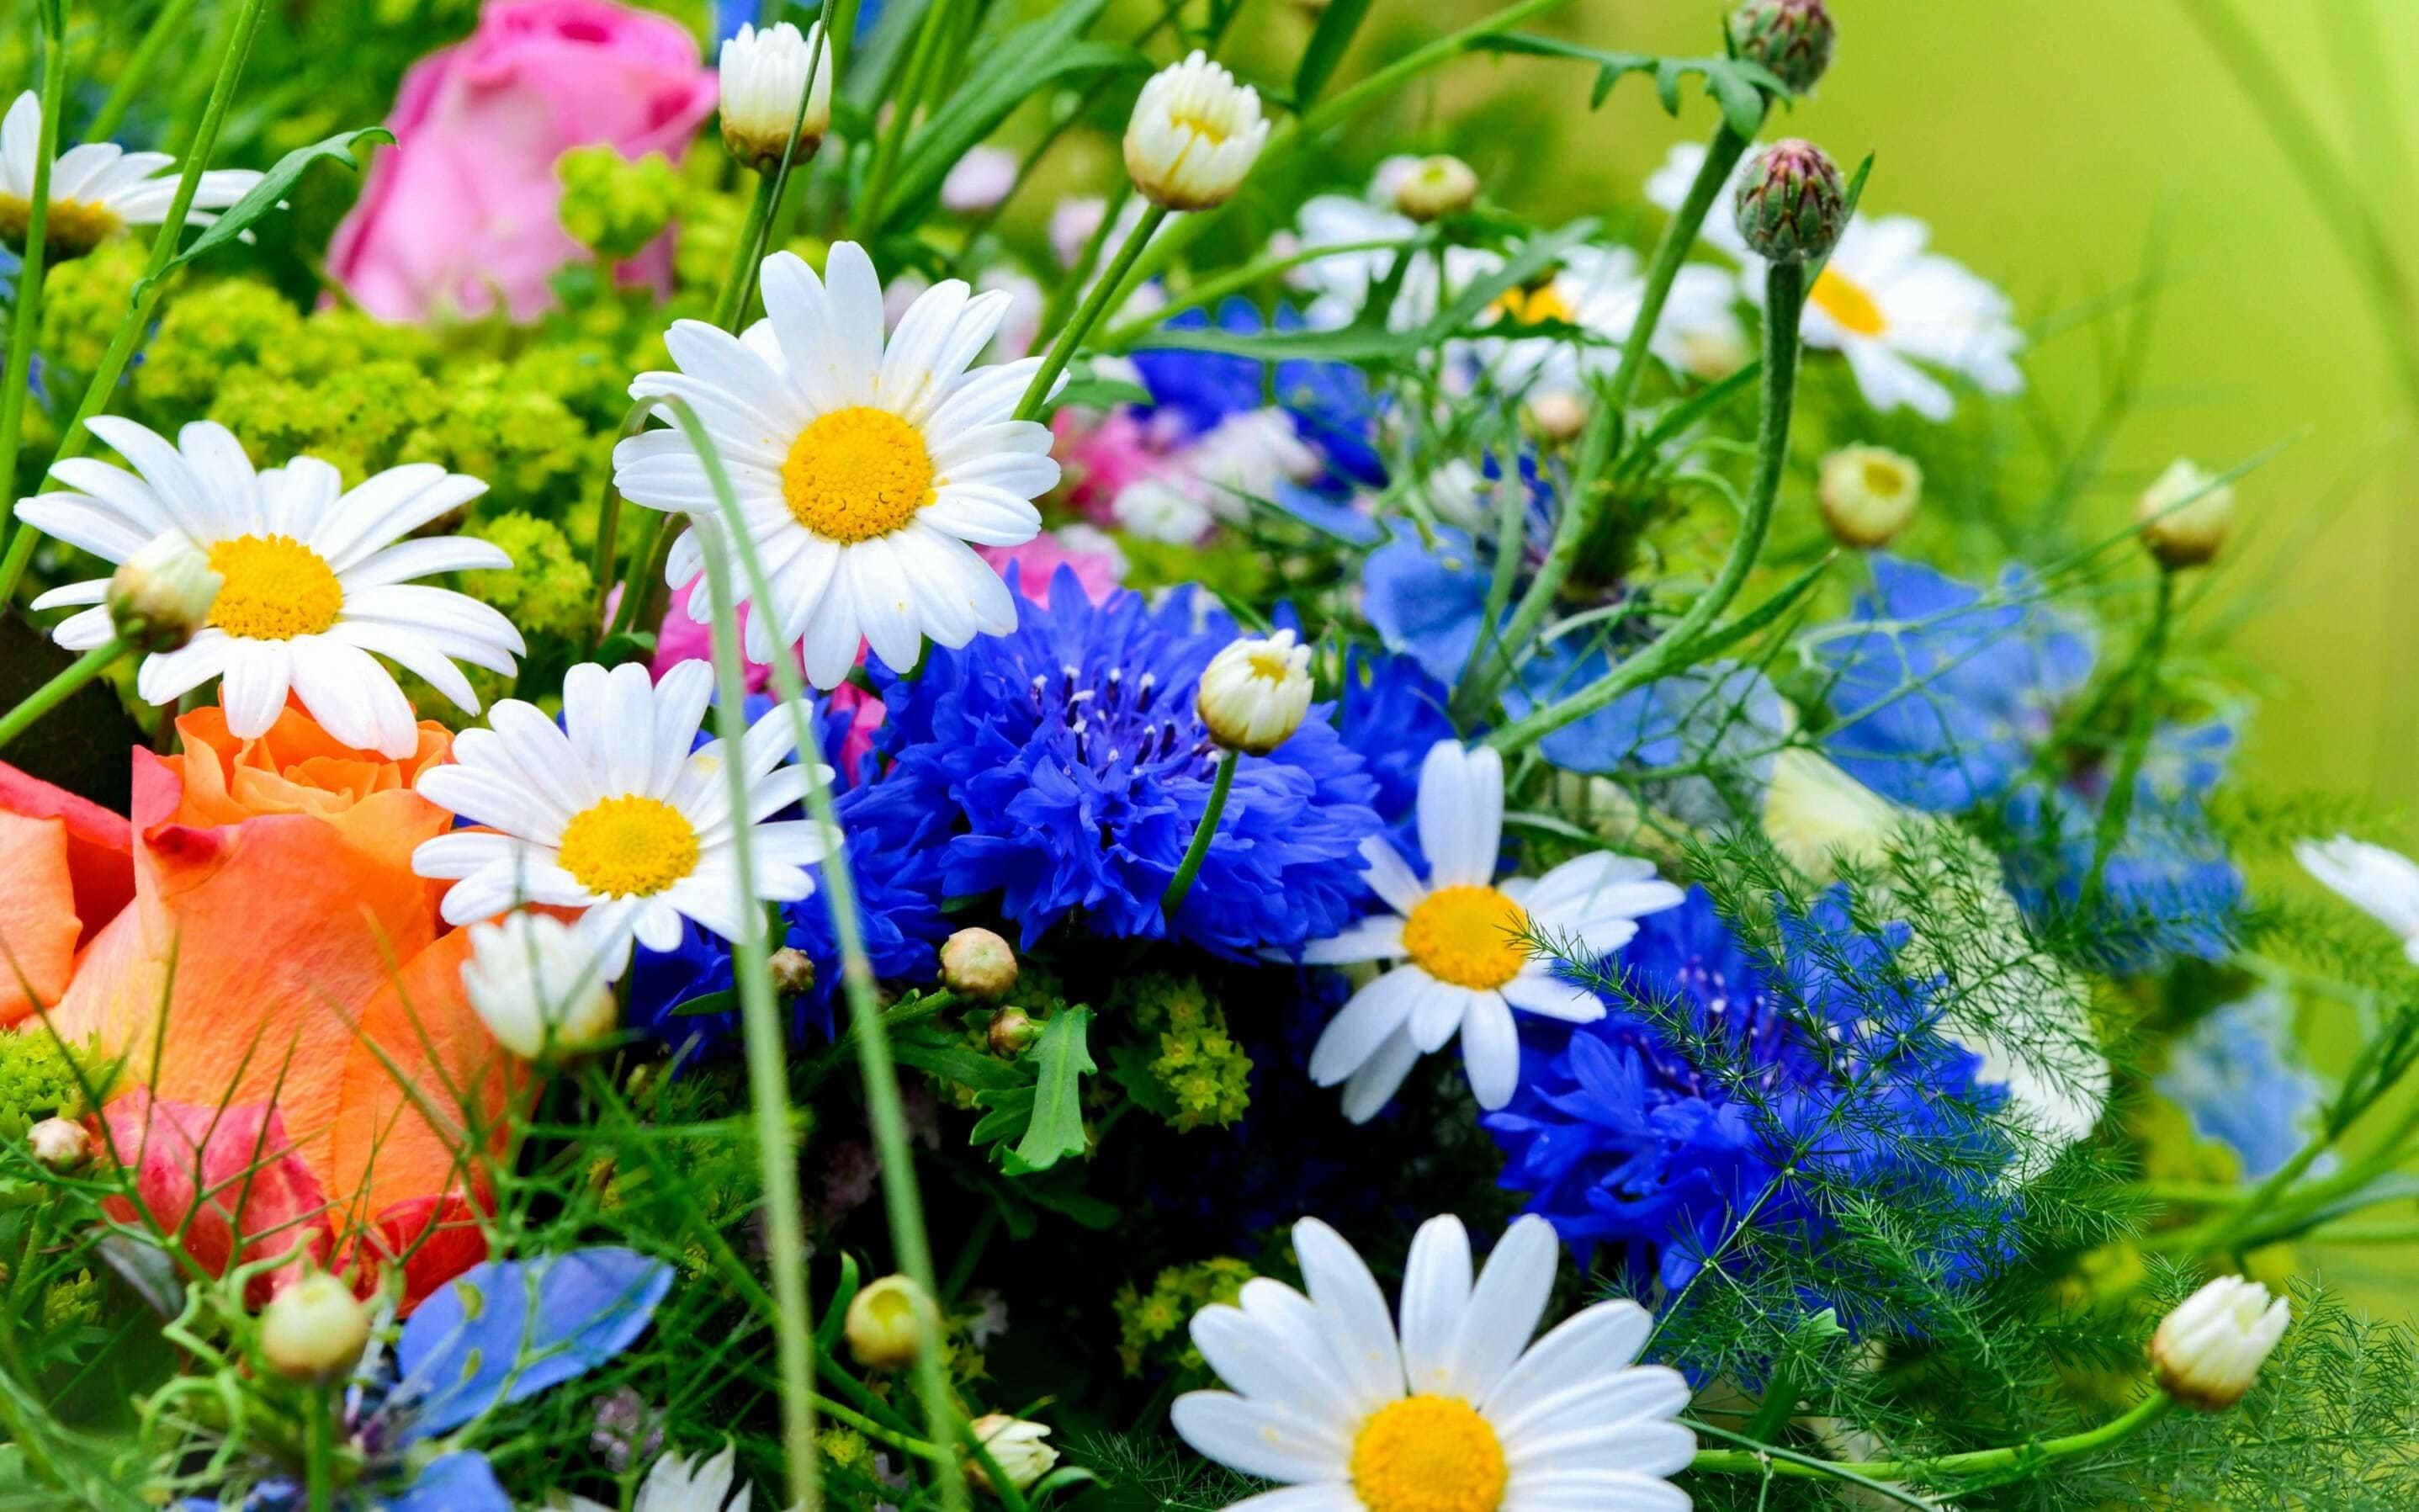 http://www.voprosy-kak-i-pochemu.ru/wp-content/uploads/2014/12/flowers.jpg